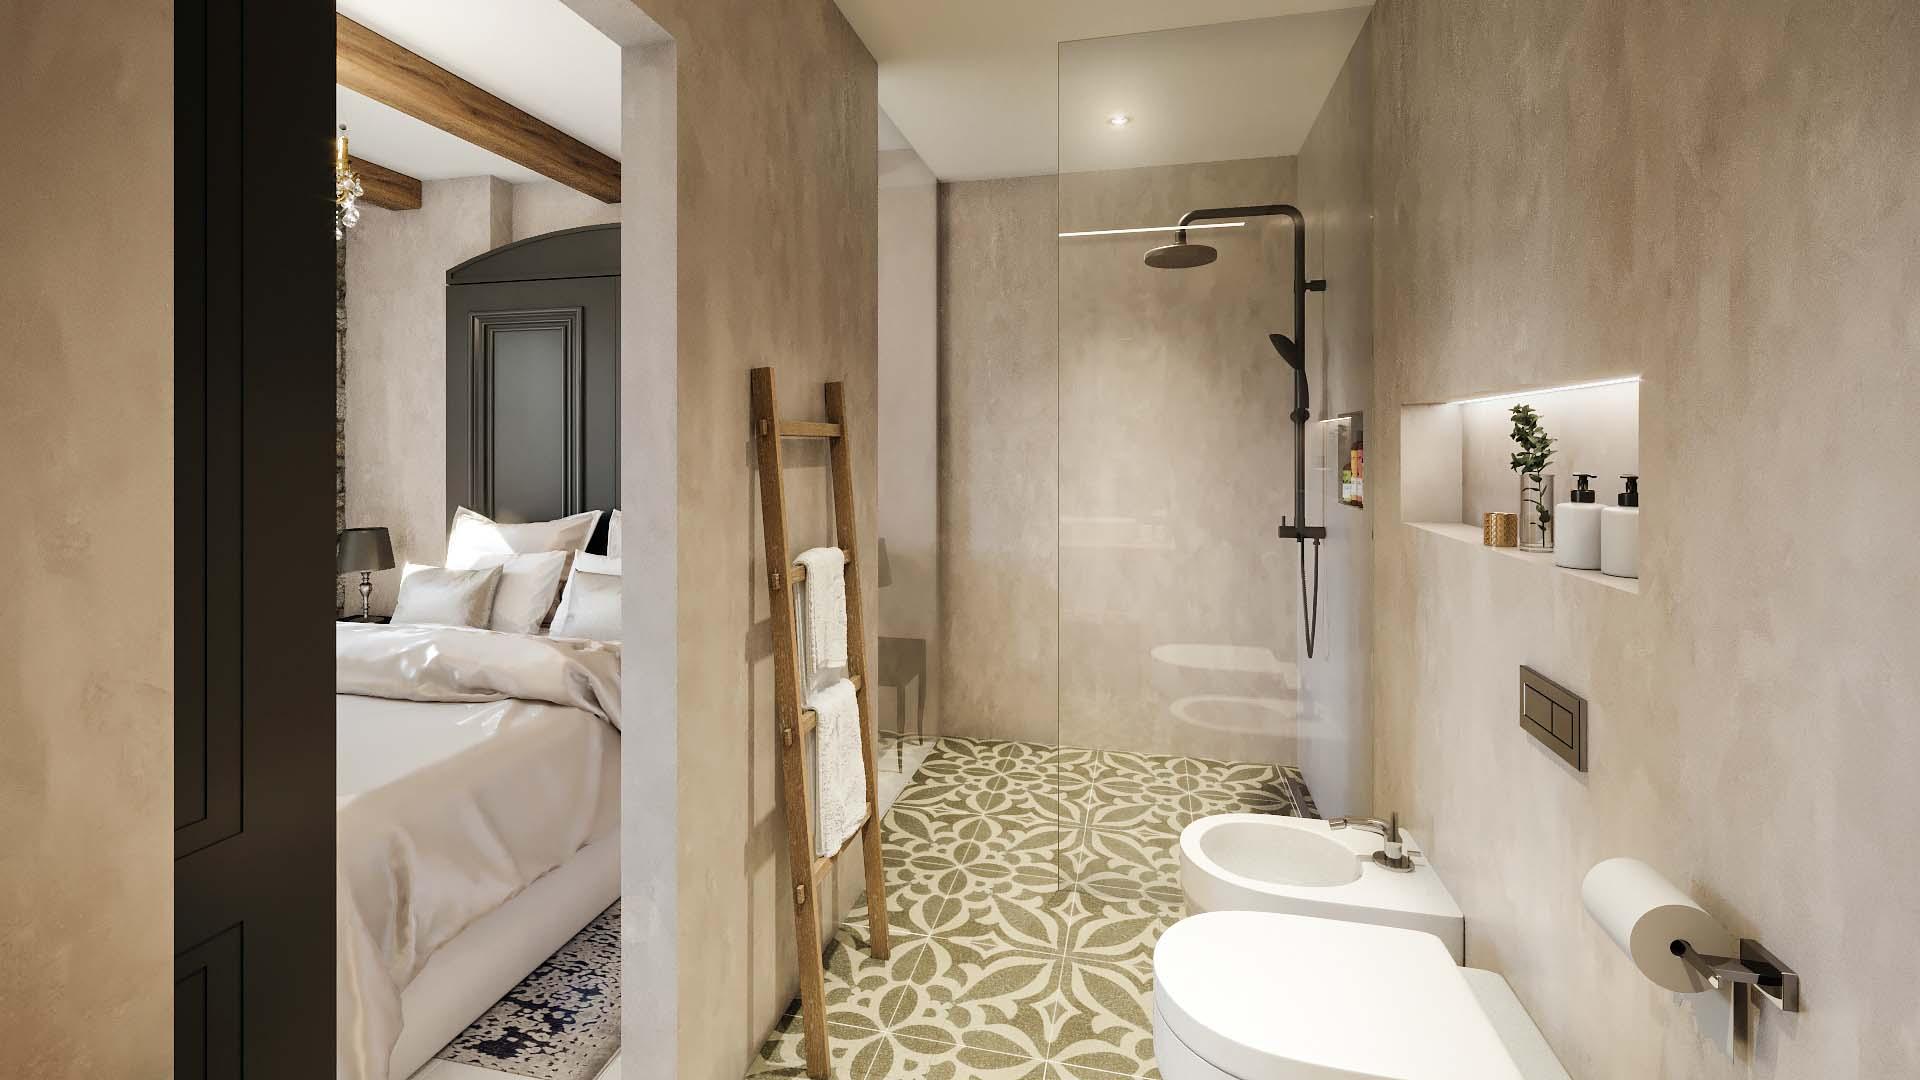 POKE_studio_services_hospitality_room.jpg